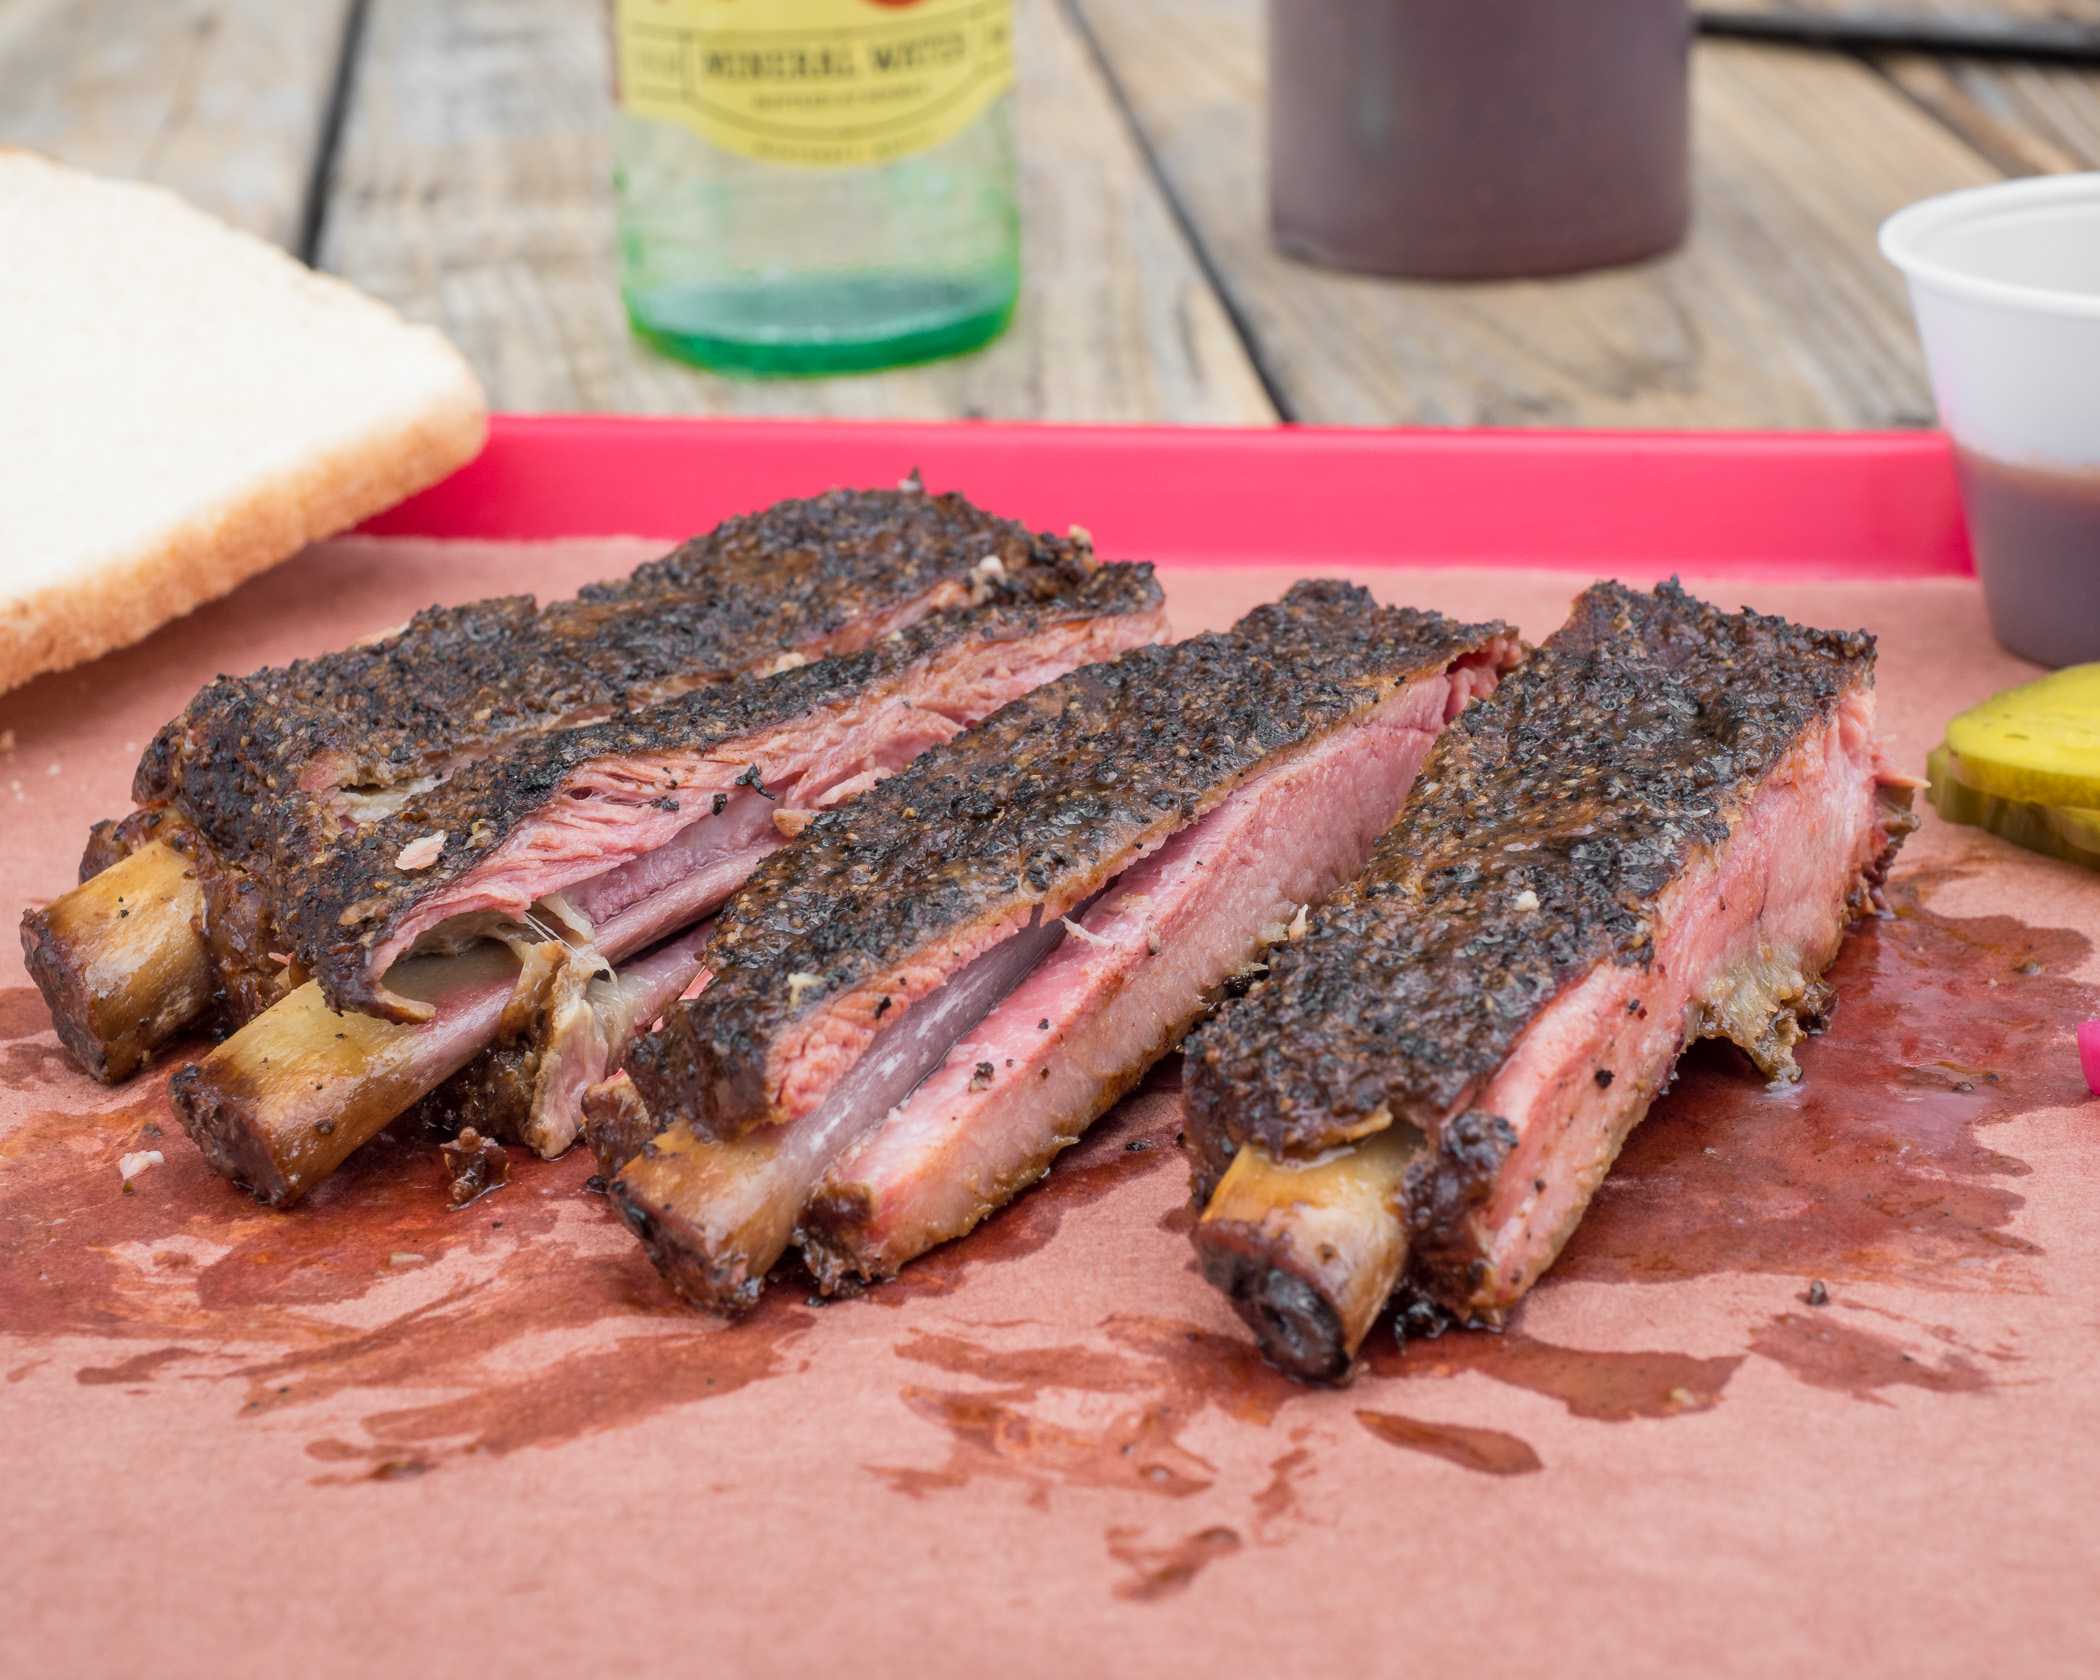 Jeremy Pawlowski Portland Texas Austin Amarillo Food Photographer Photography Fare Photo Studios bbq barbecue barbeque ribs bark